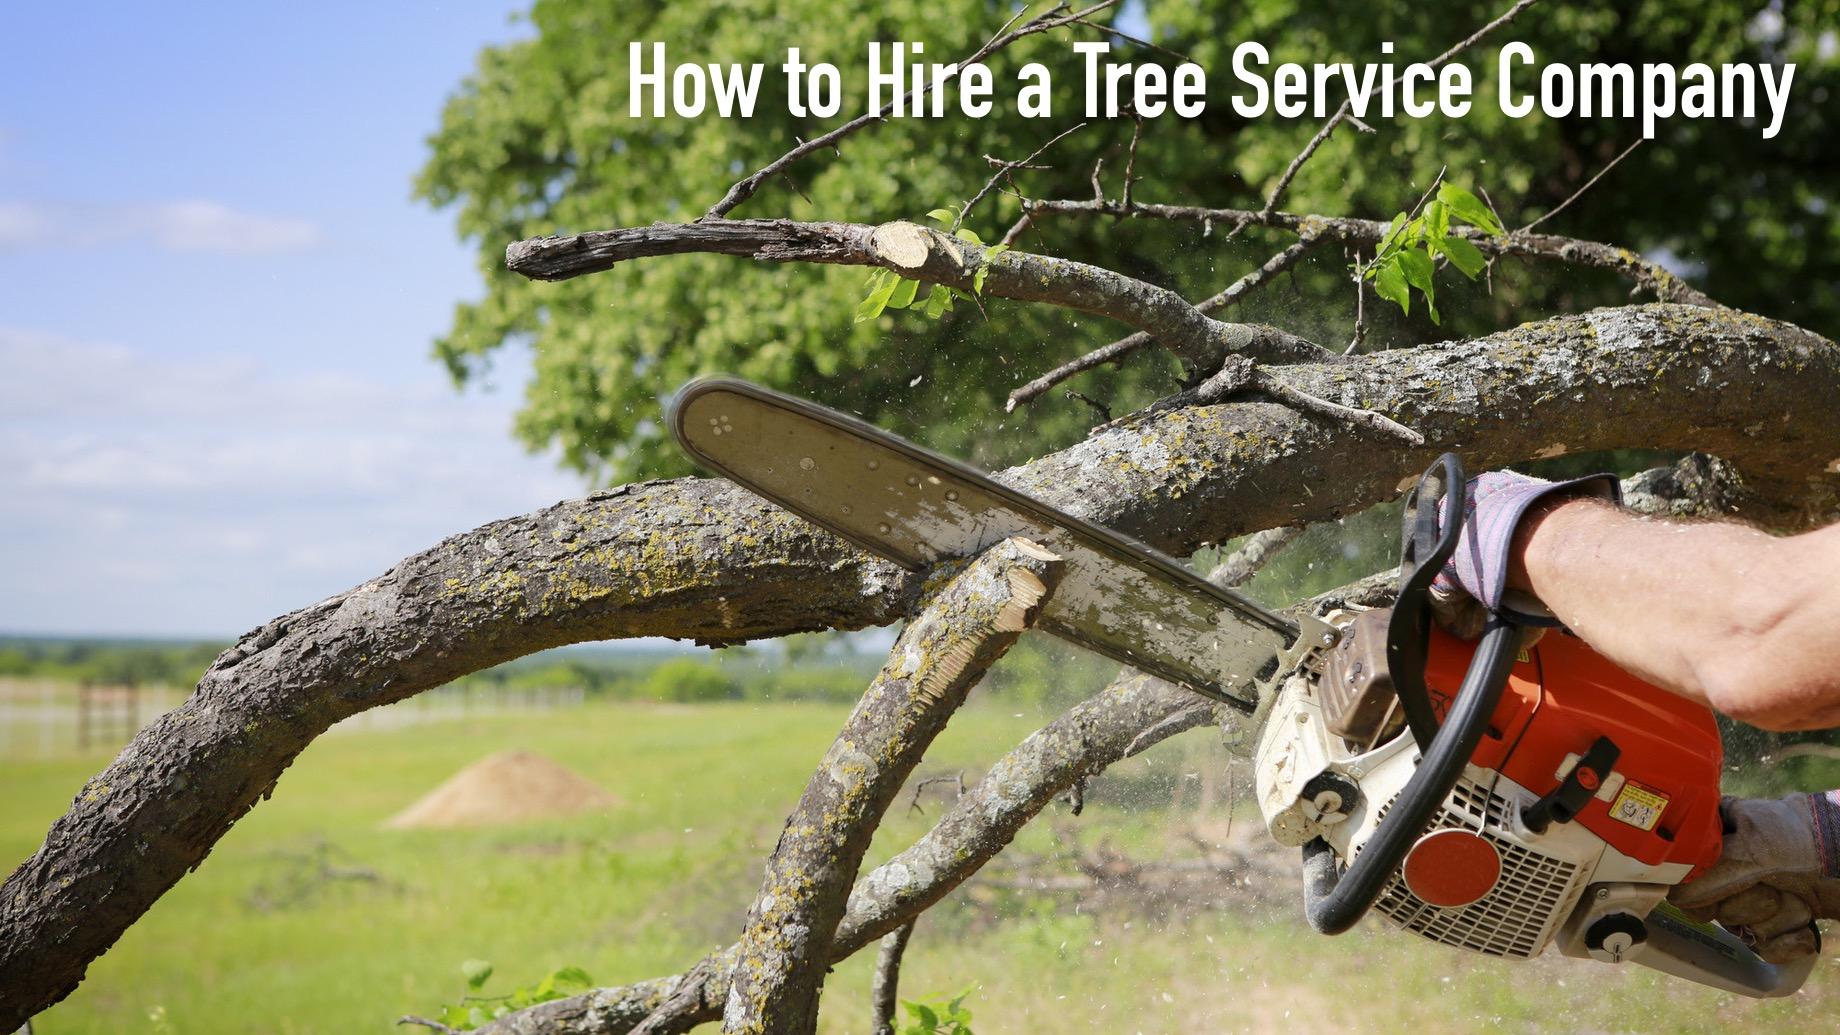 How to Hire a Tree Service Company